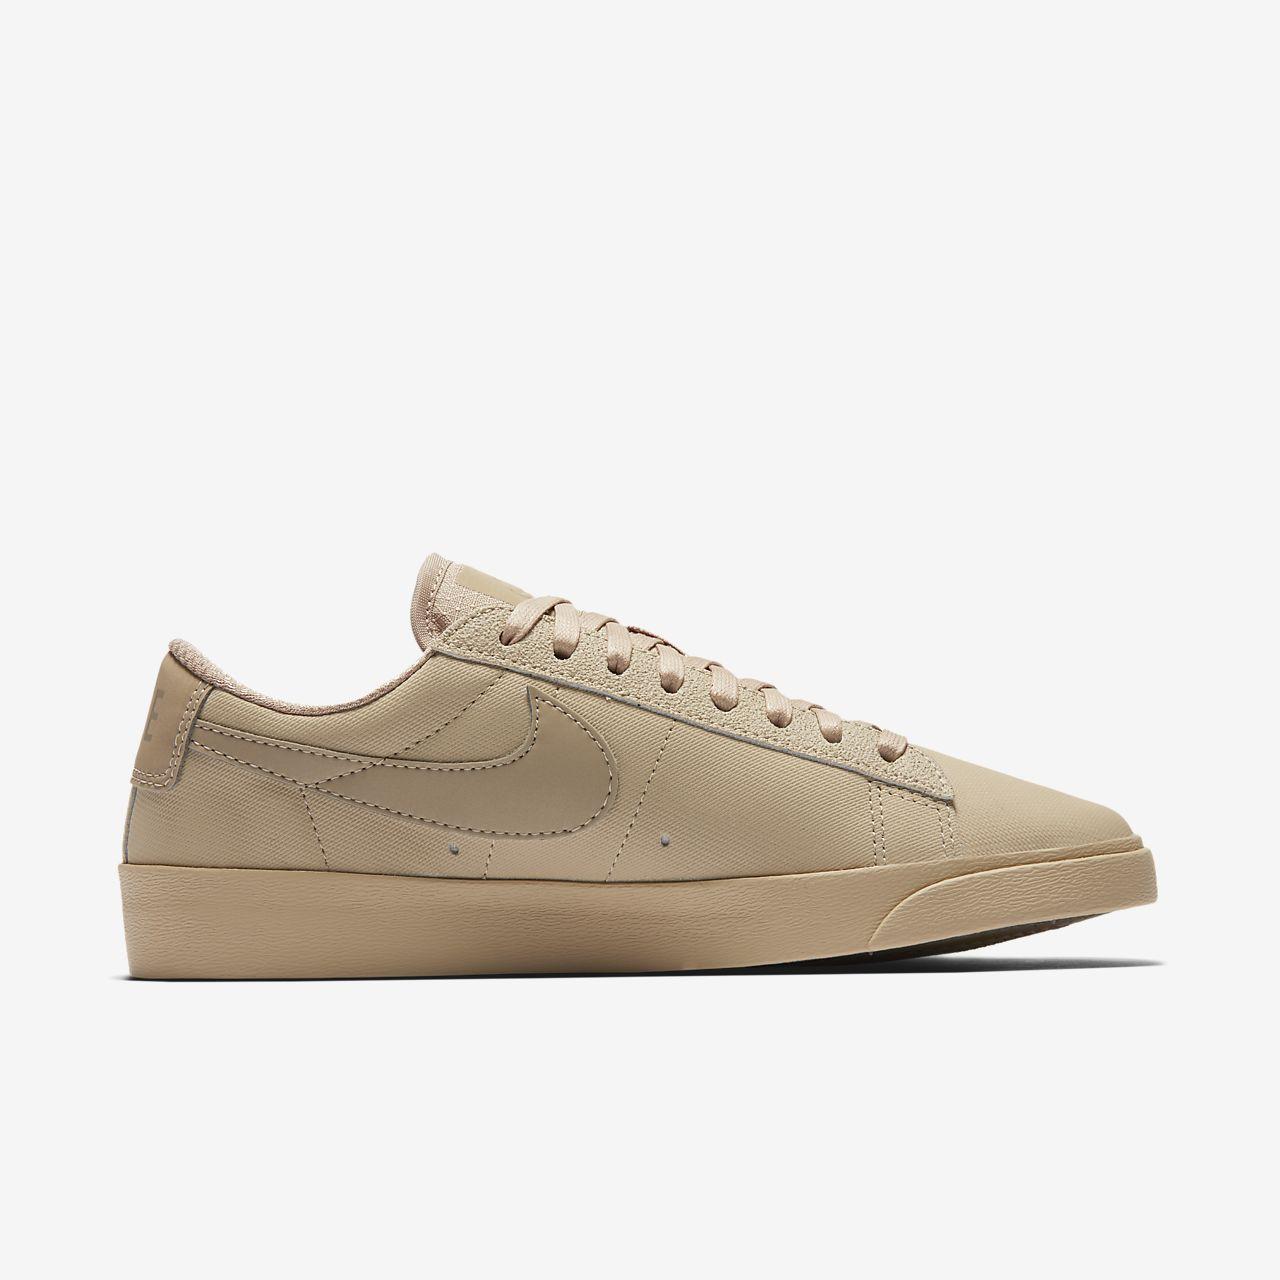 ... Nike Blazer Low Pinnacle Women's Shoe